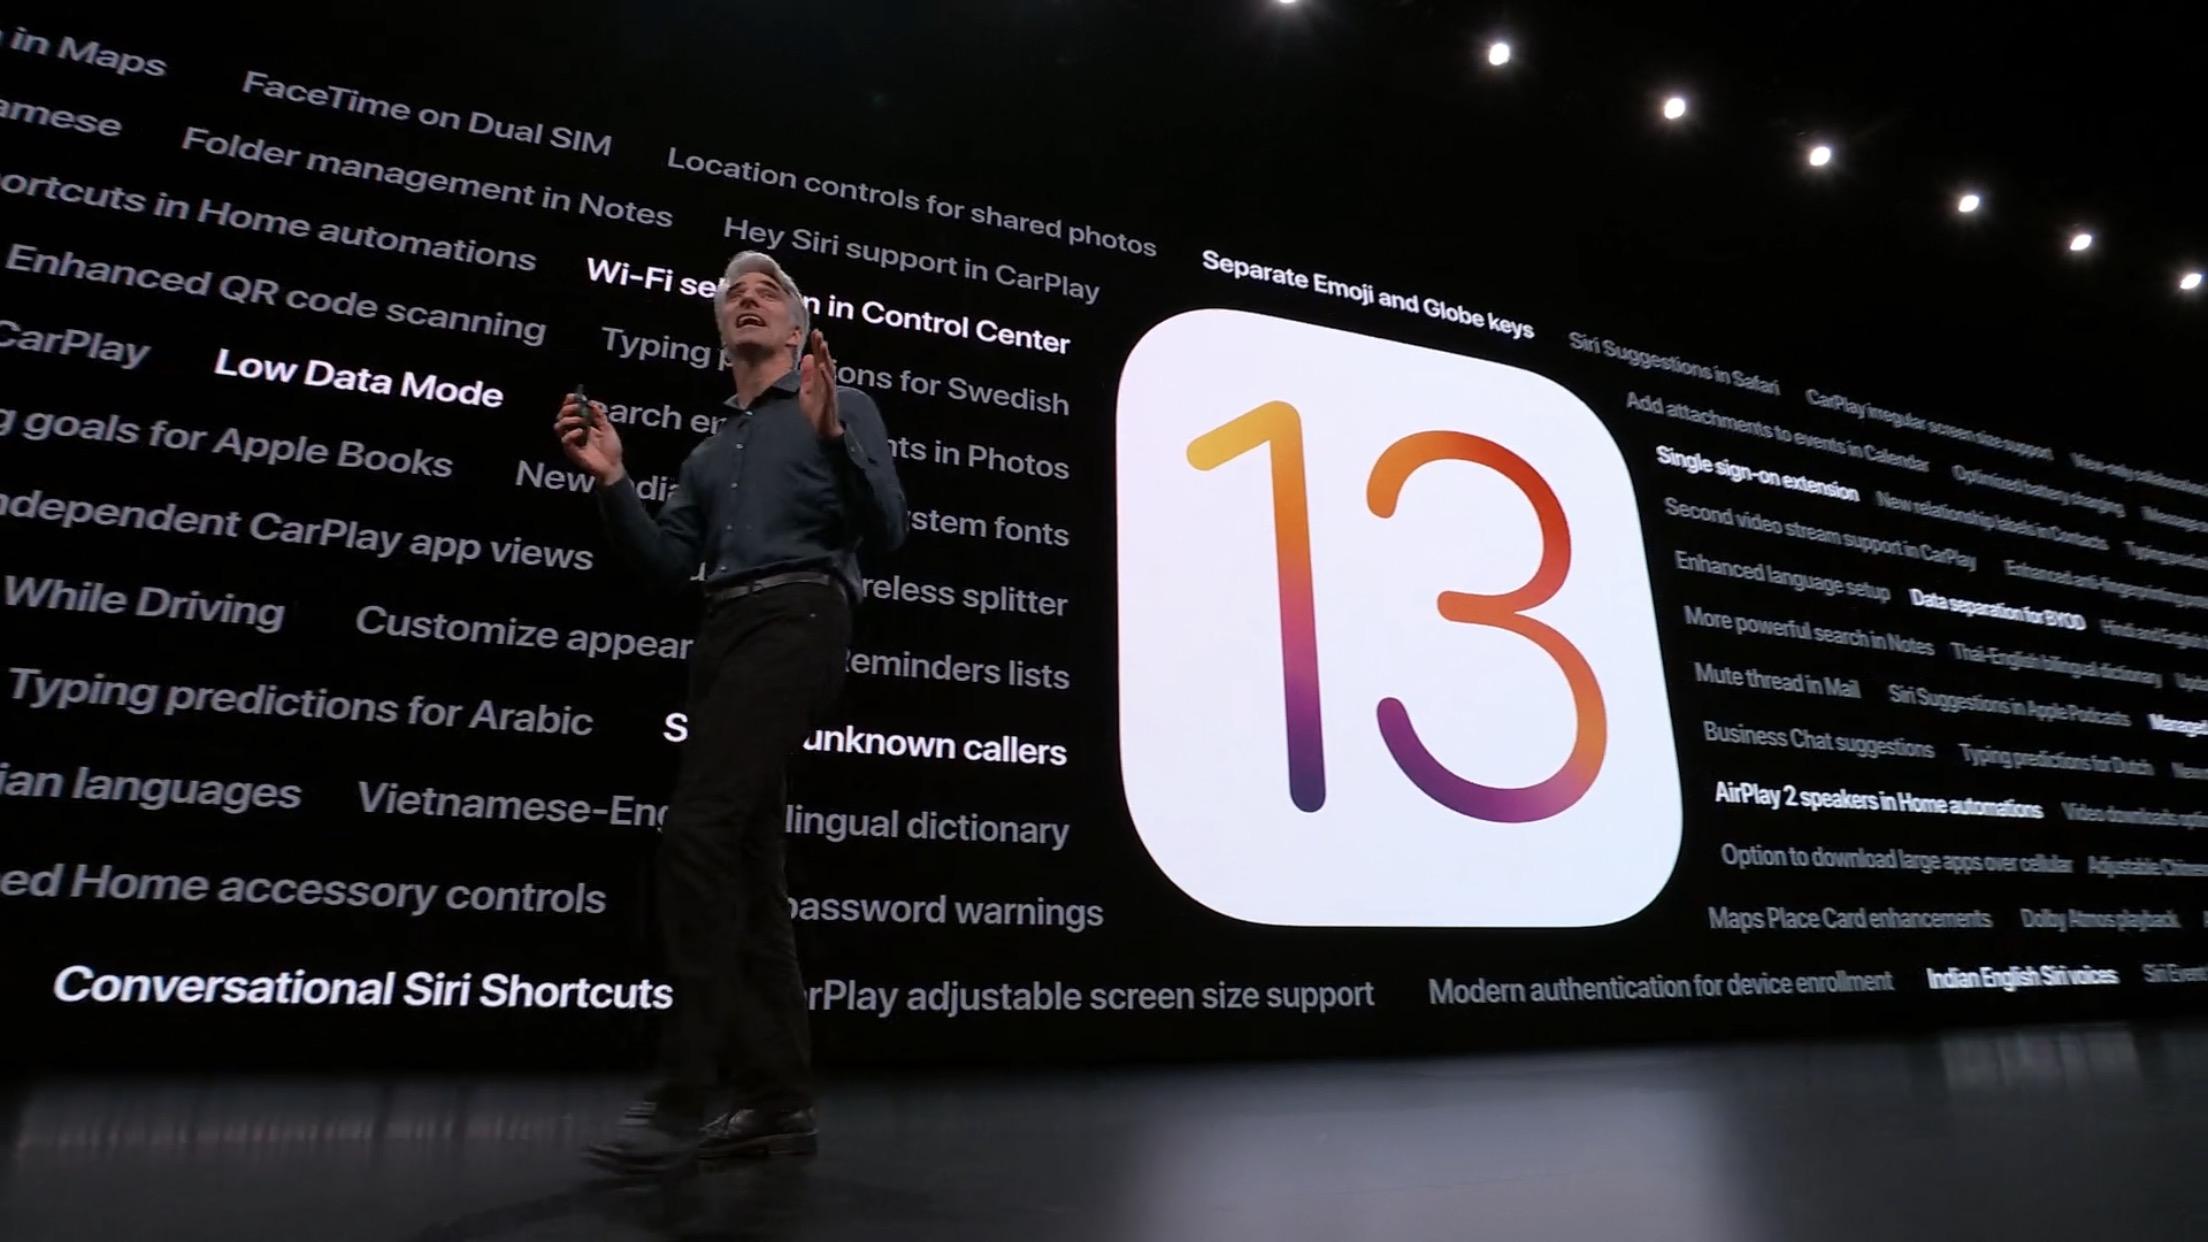 「iOS 13」の新機能・変更点まとめ